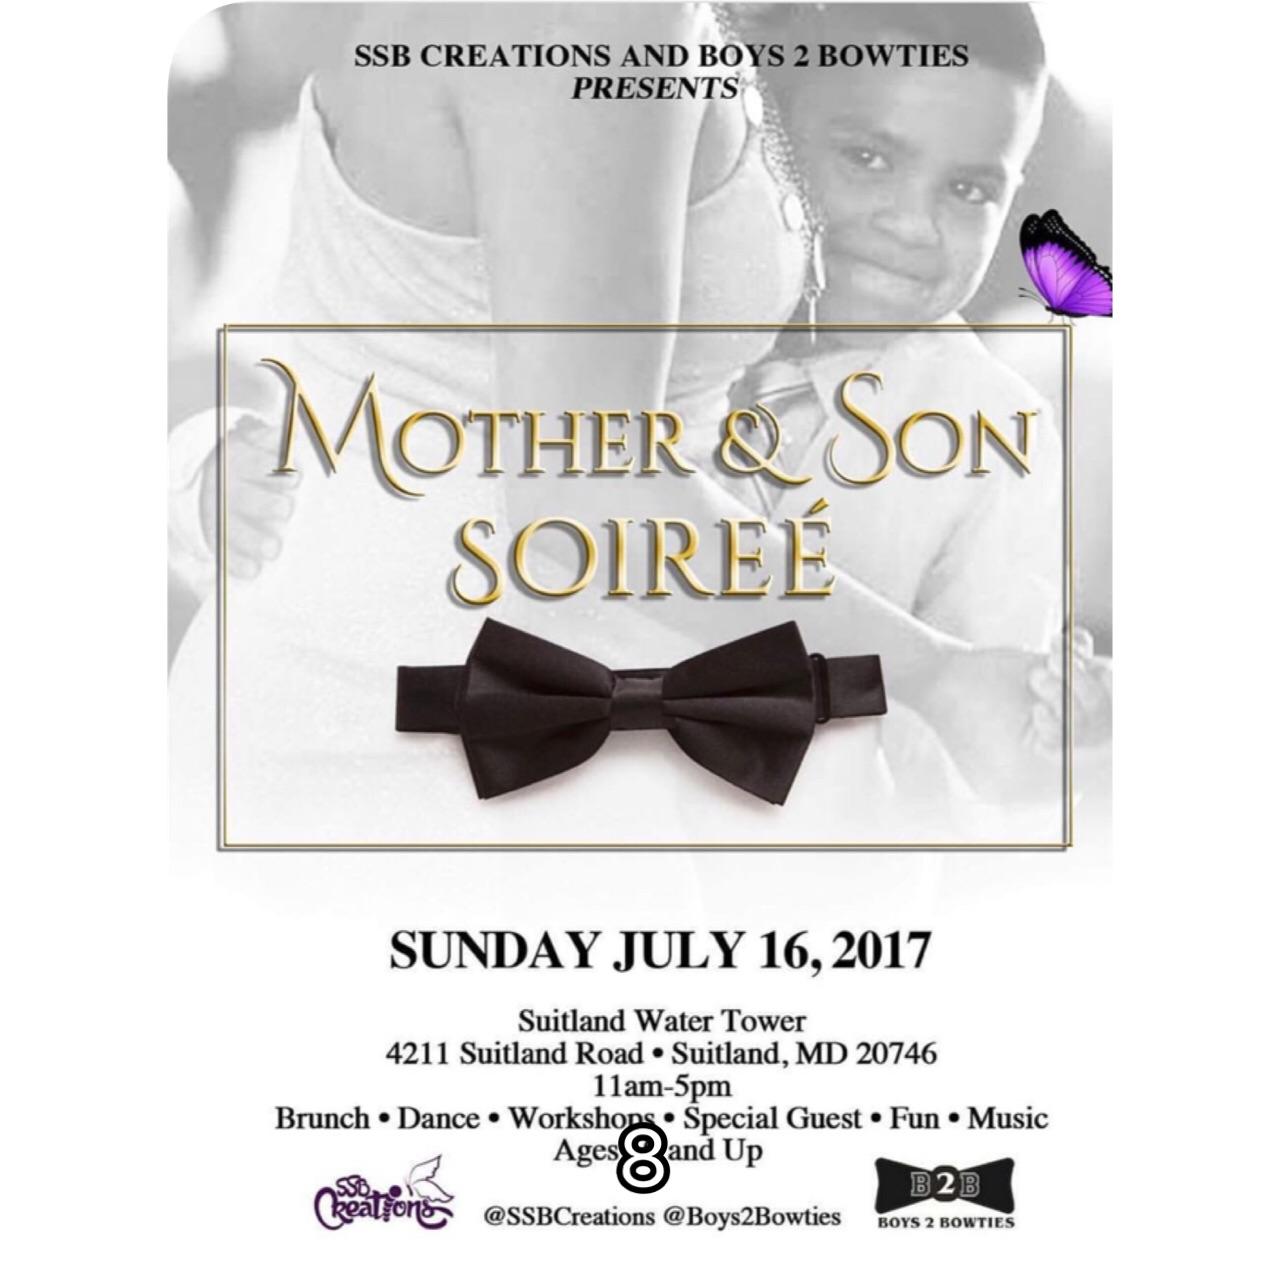 Mother Son Dance Songs 2017: Mother & Son Soirée Tickets, Sun, Jul 16, 2017 At 11:00 AM